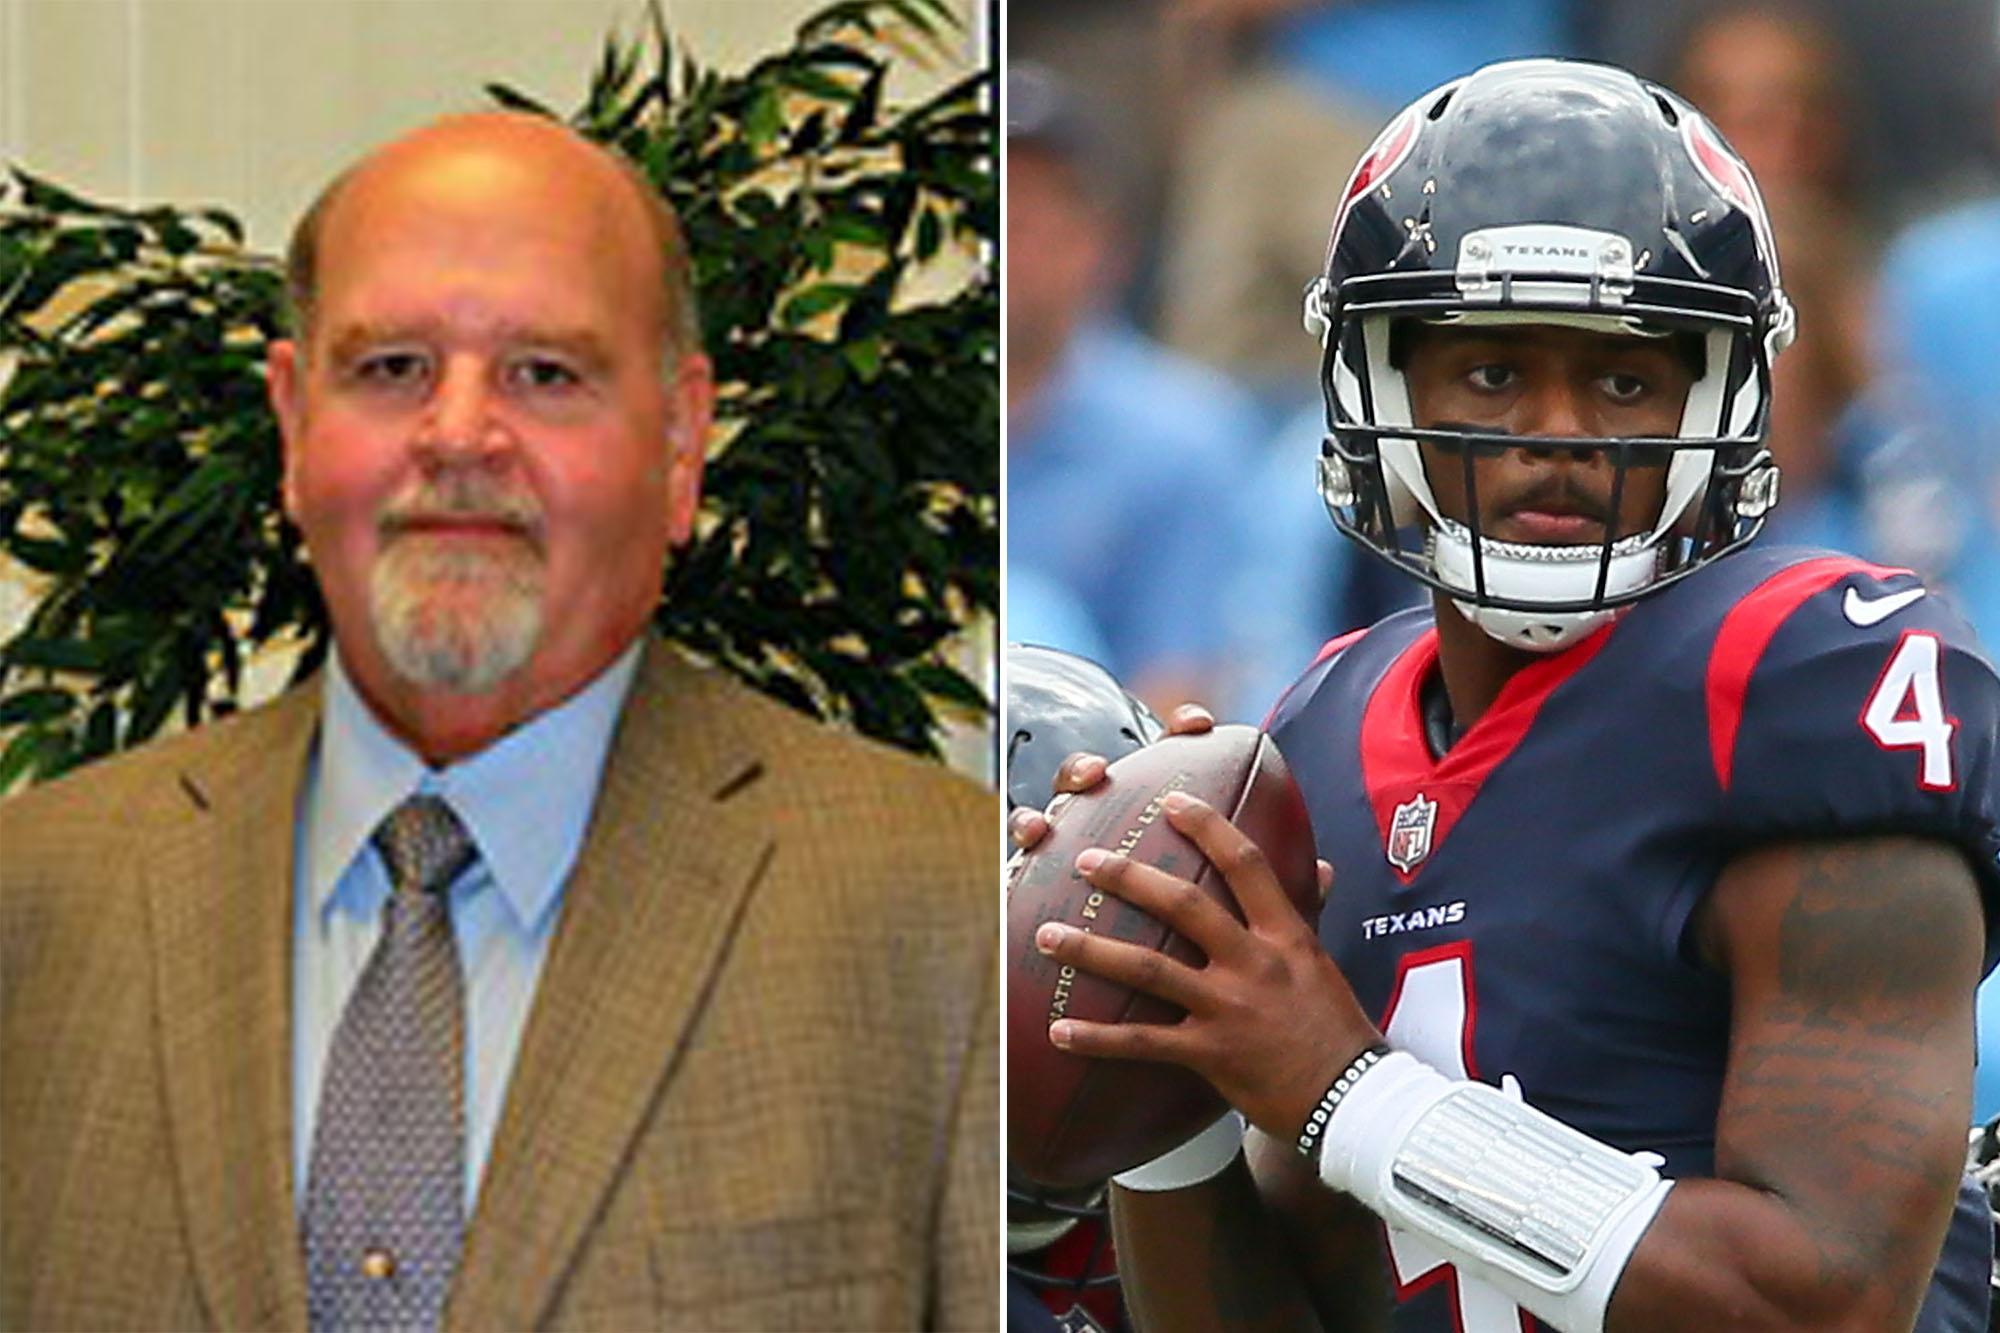 School superintendent on Texans star Deshaun Watson: You